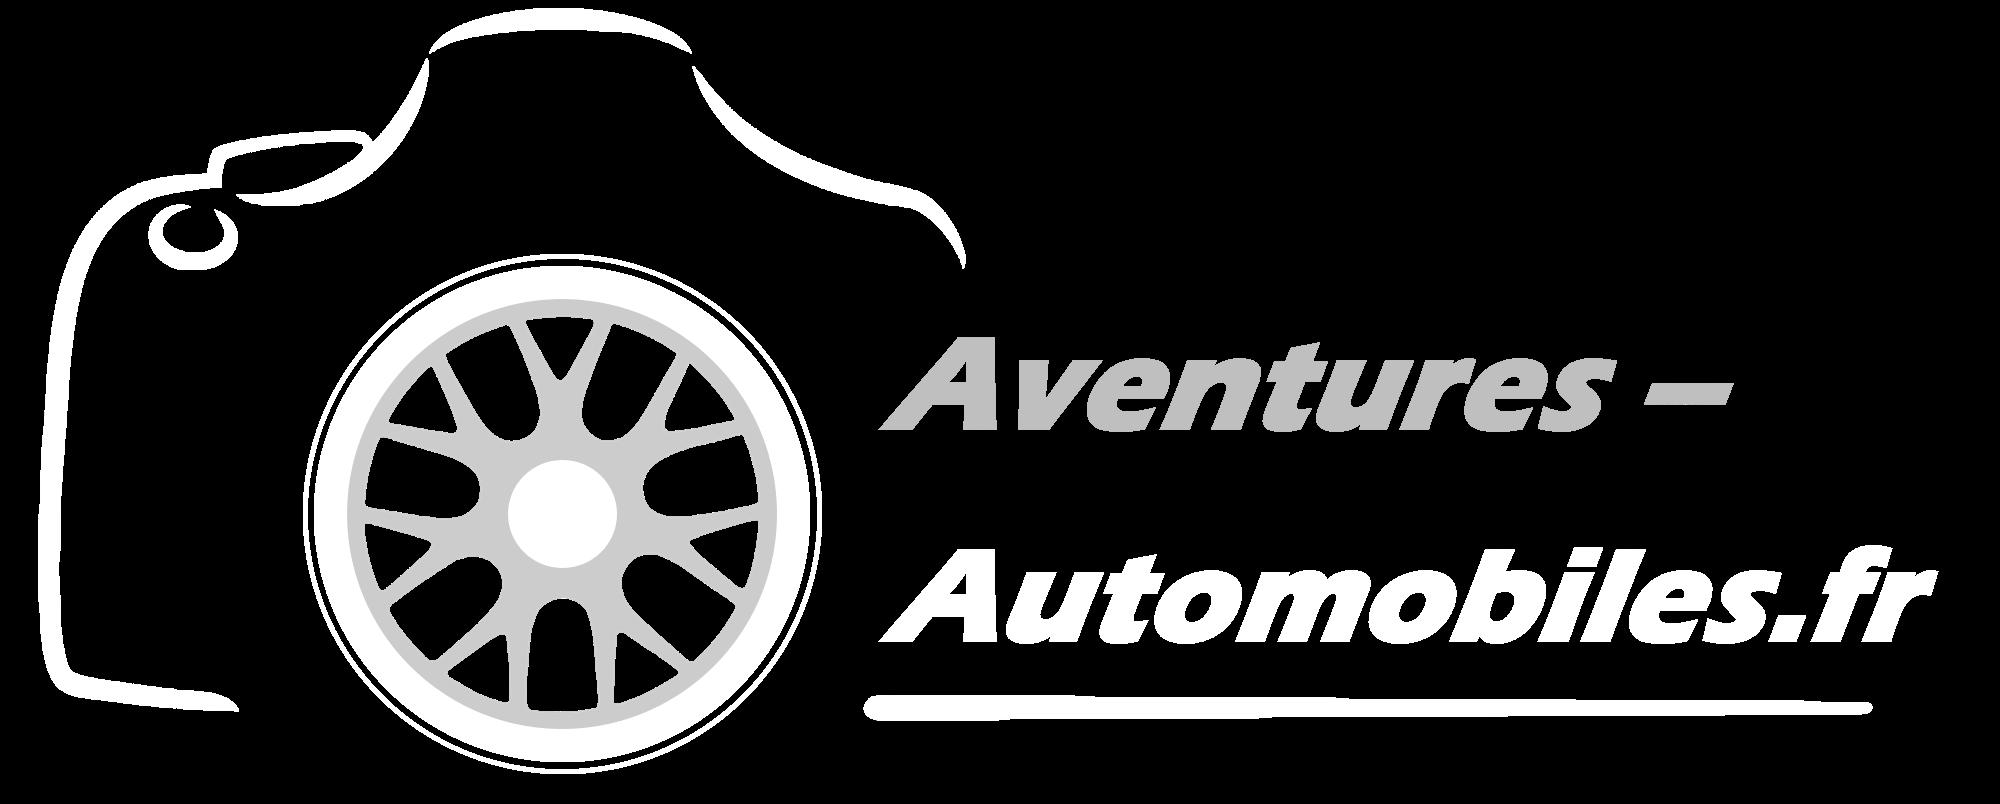 Aventures-Automobiles.fr